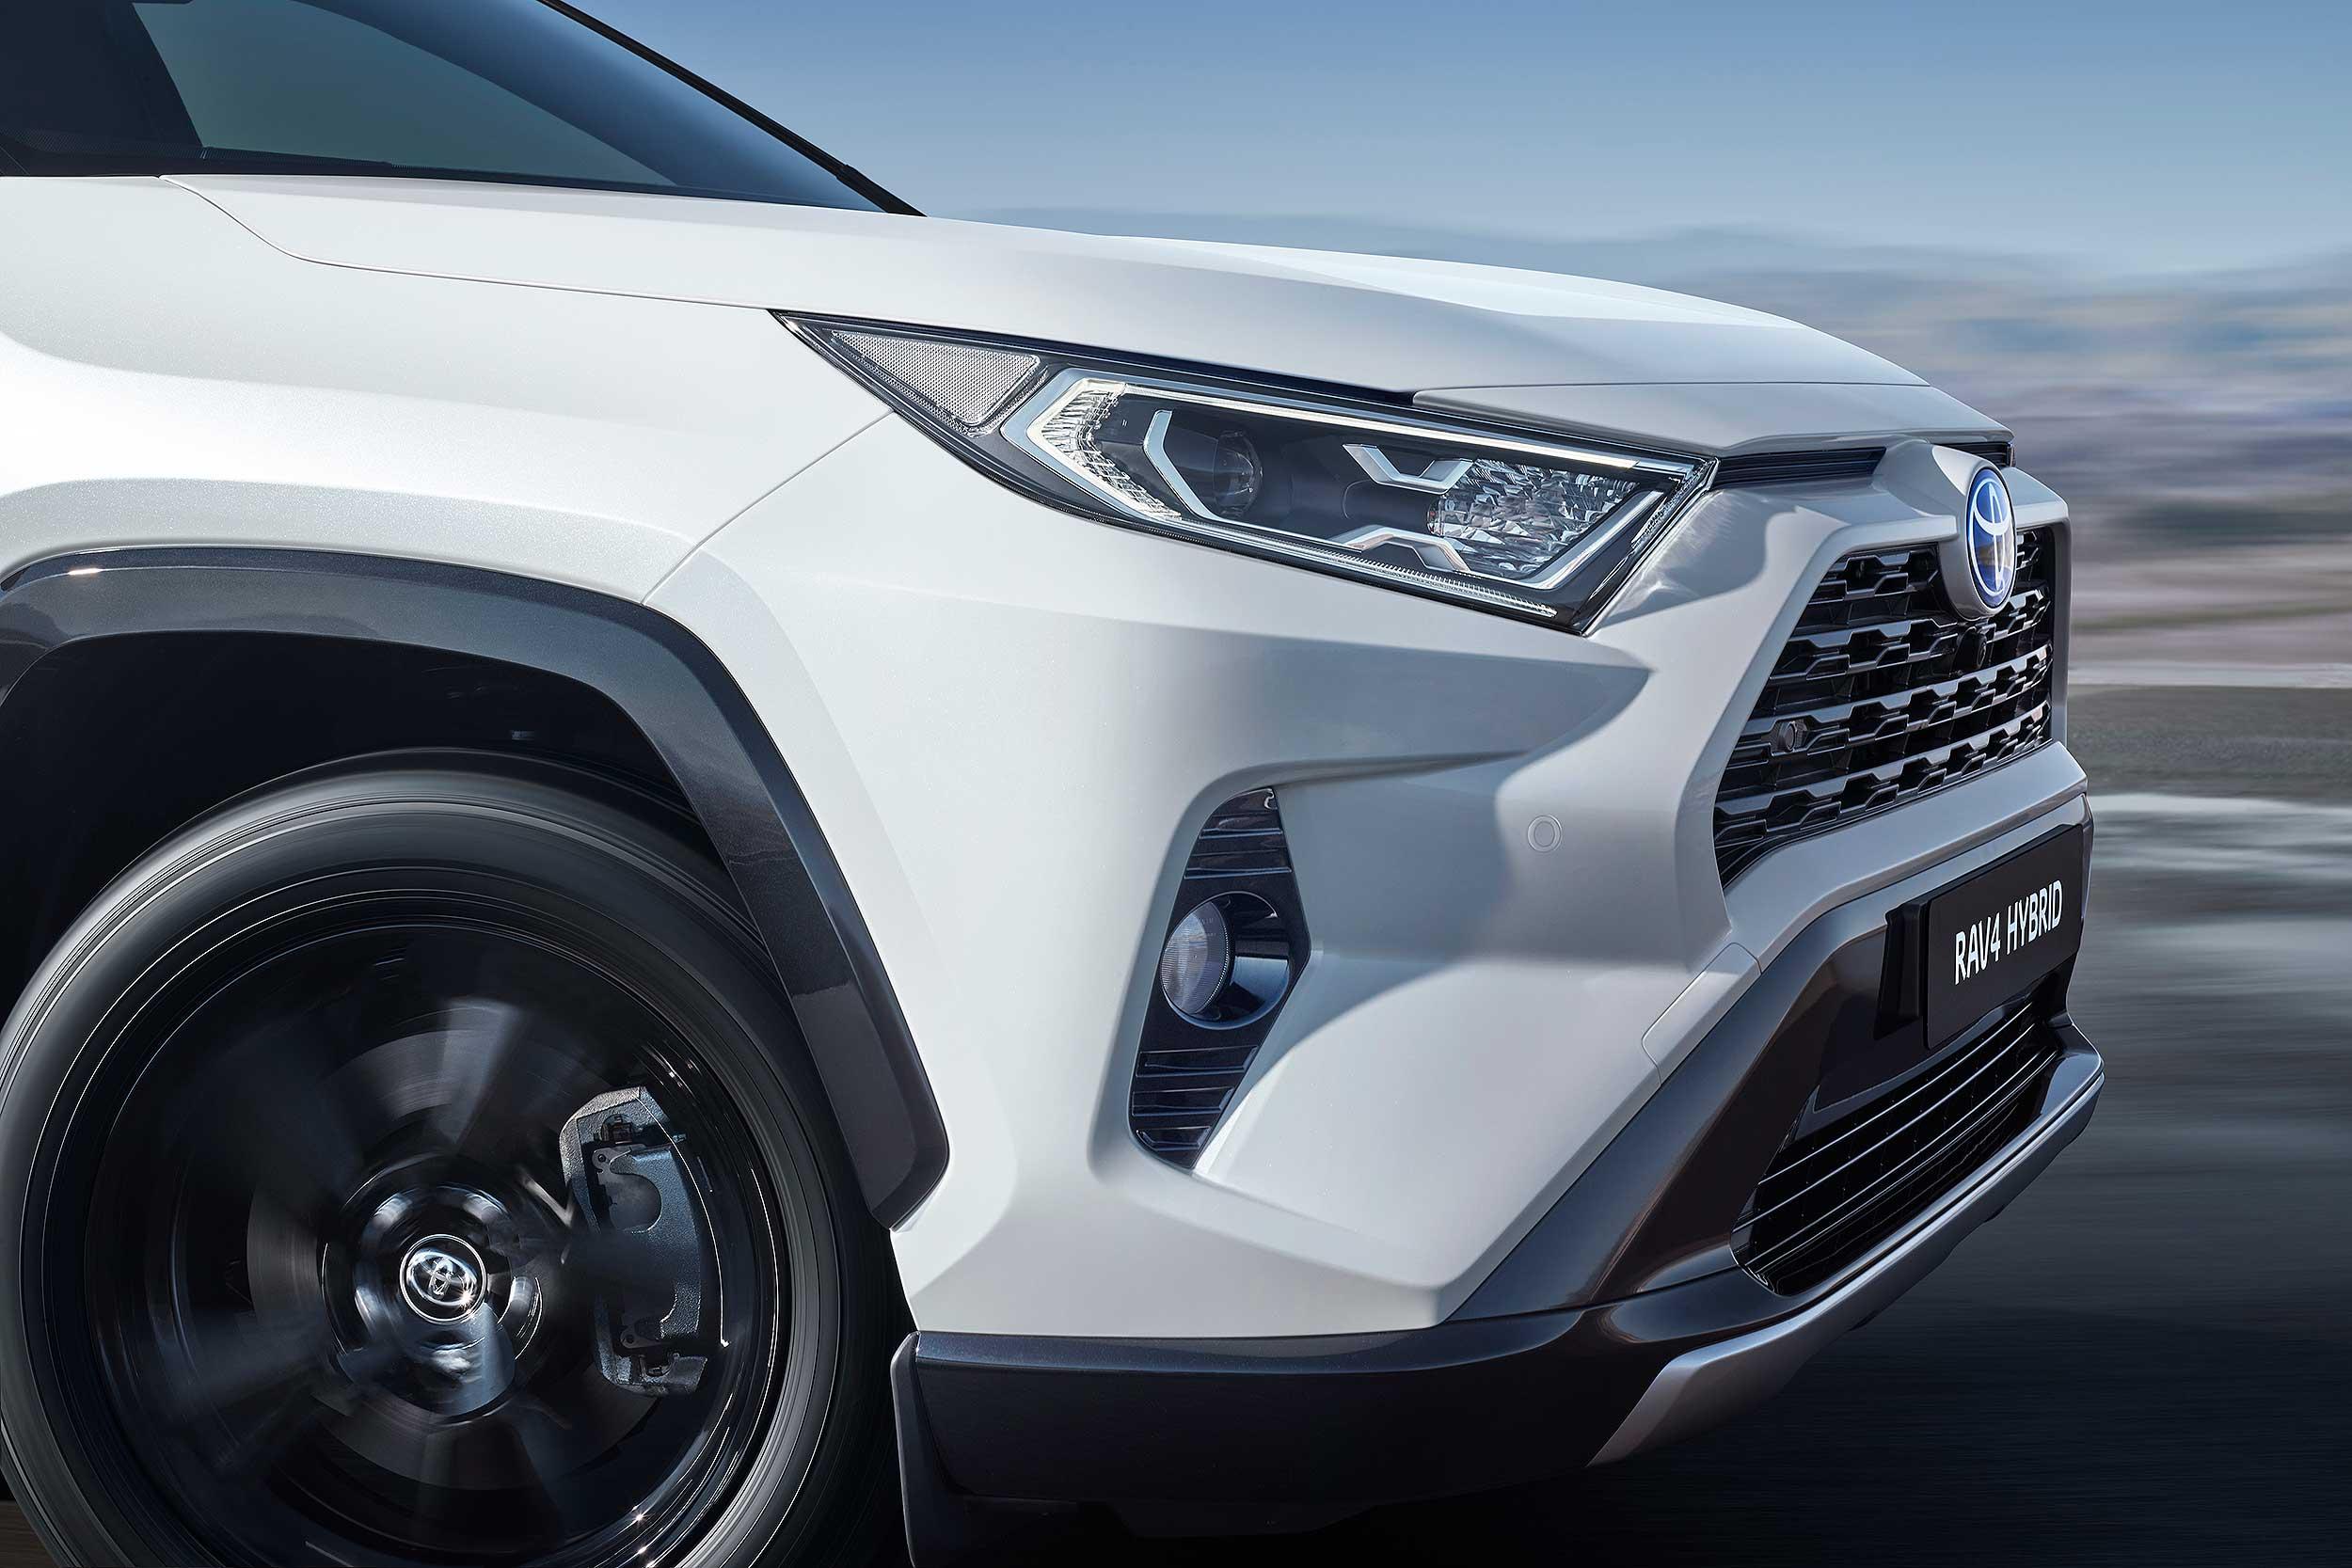 New 2019 Toyota Rav4 Priced From Under 163 30 000 Motoring